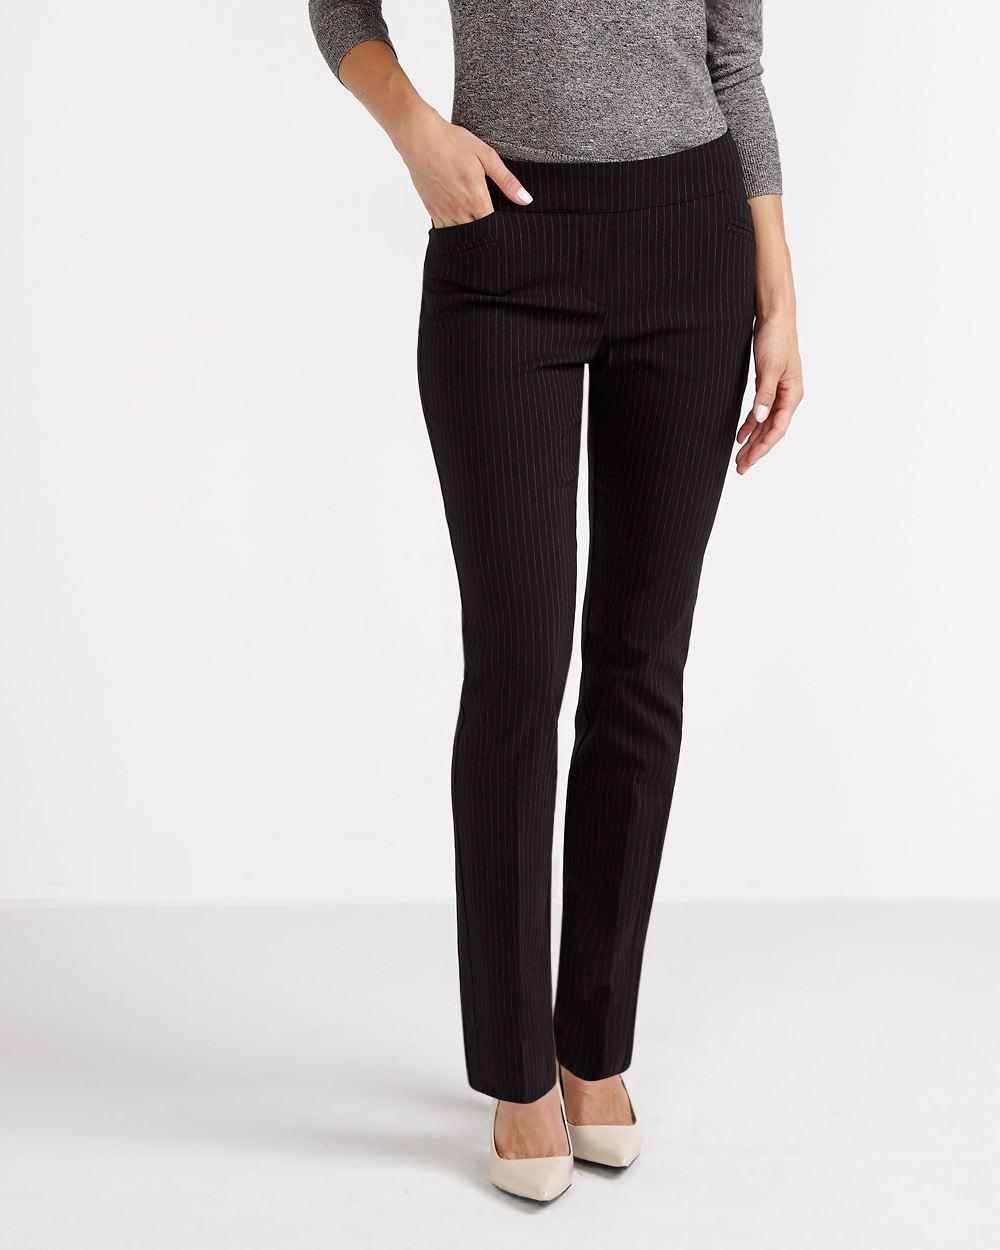 pantalon nylon avec talons aiguilles